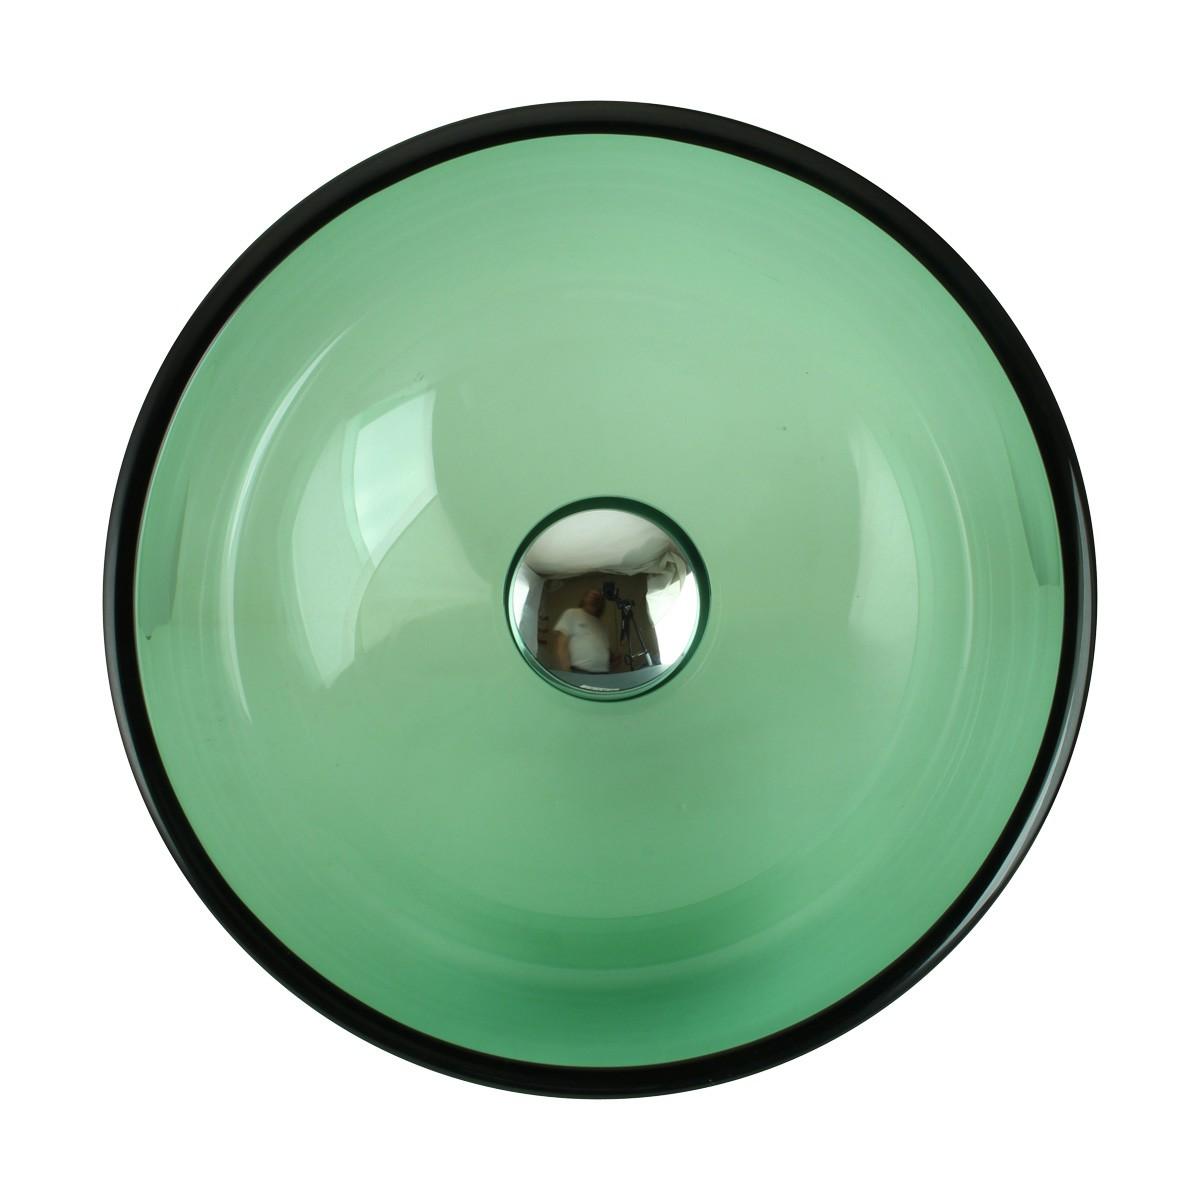 Tempered Glass Vessel Sink with Drain, Green Mini Glass Round Bowl Sink bathroom vessel sinks Countertop vessel sink Bathroom Vessel Sink